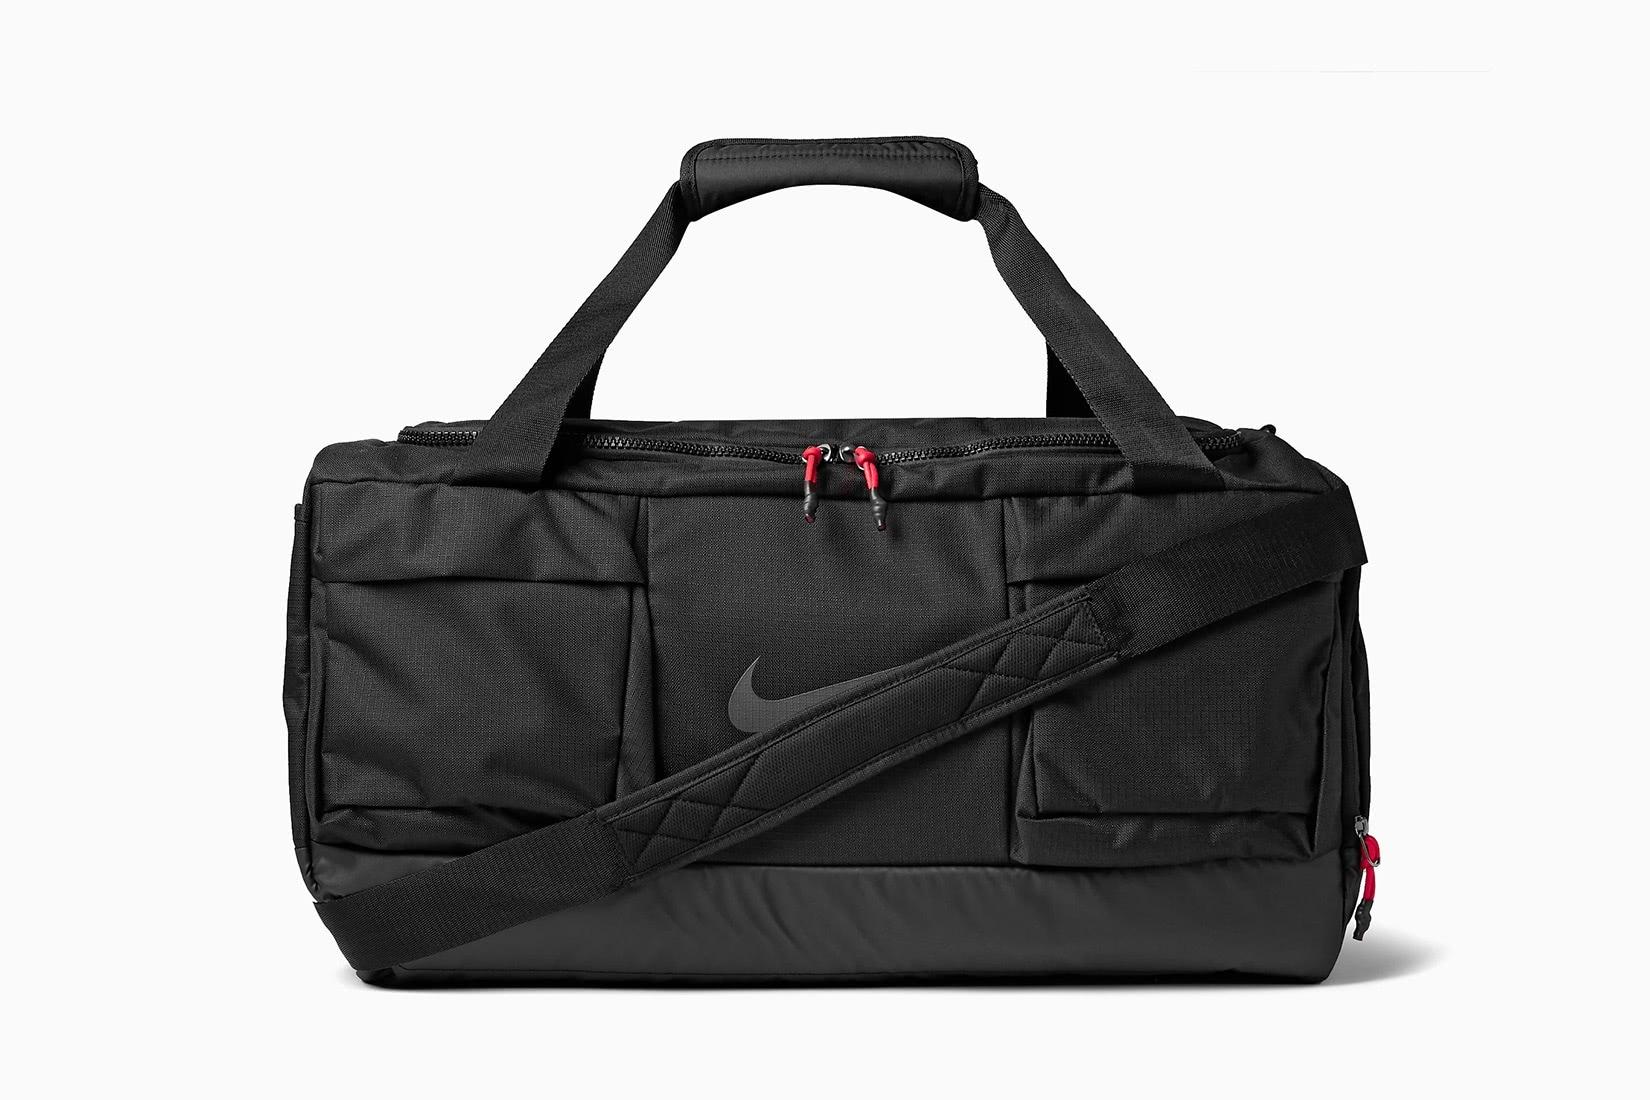 best duffel bags nike golf ripstop - Luxe Digital